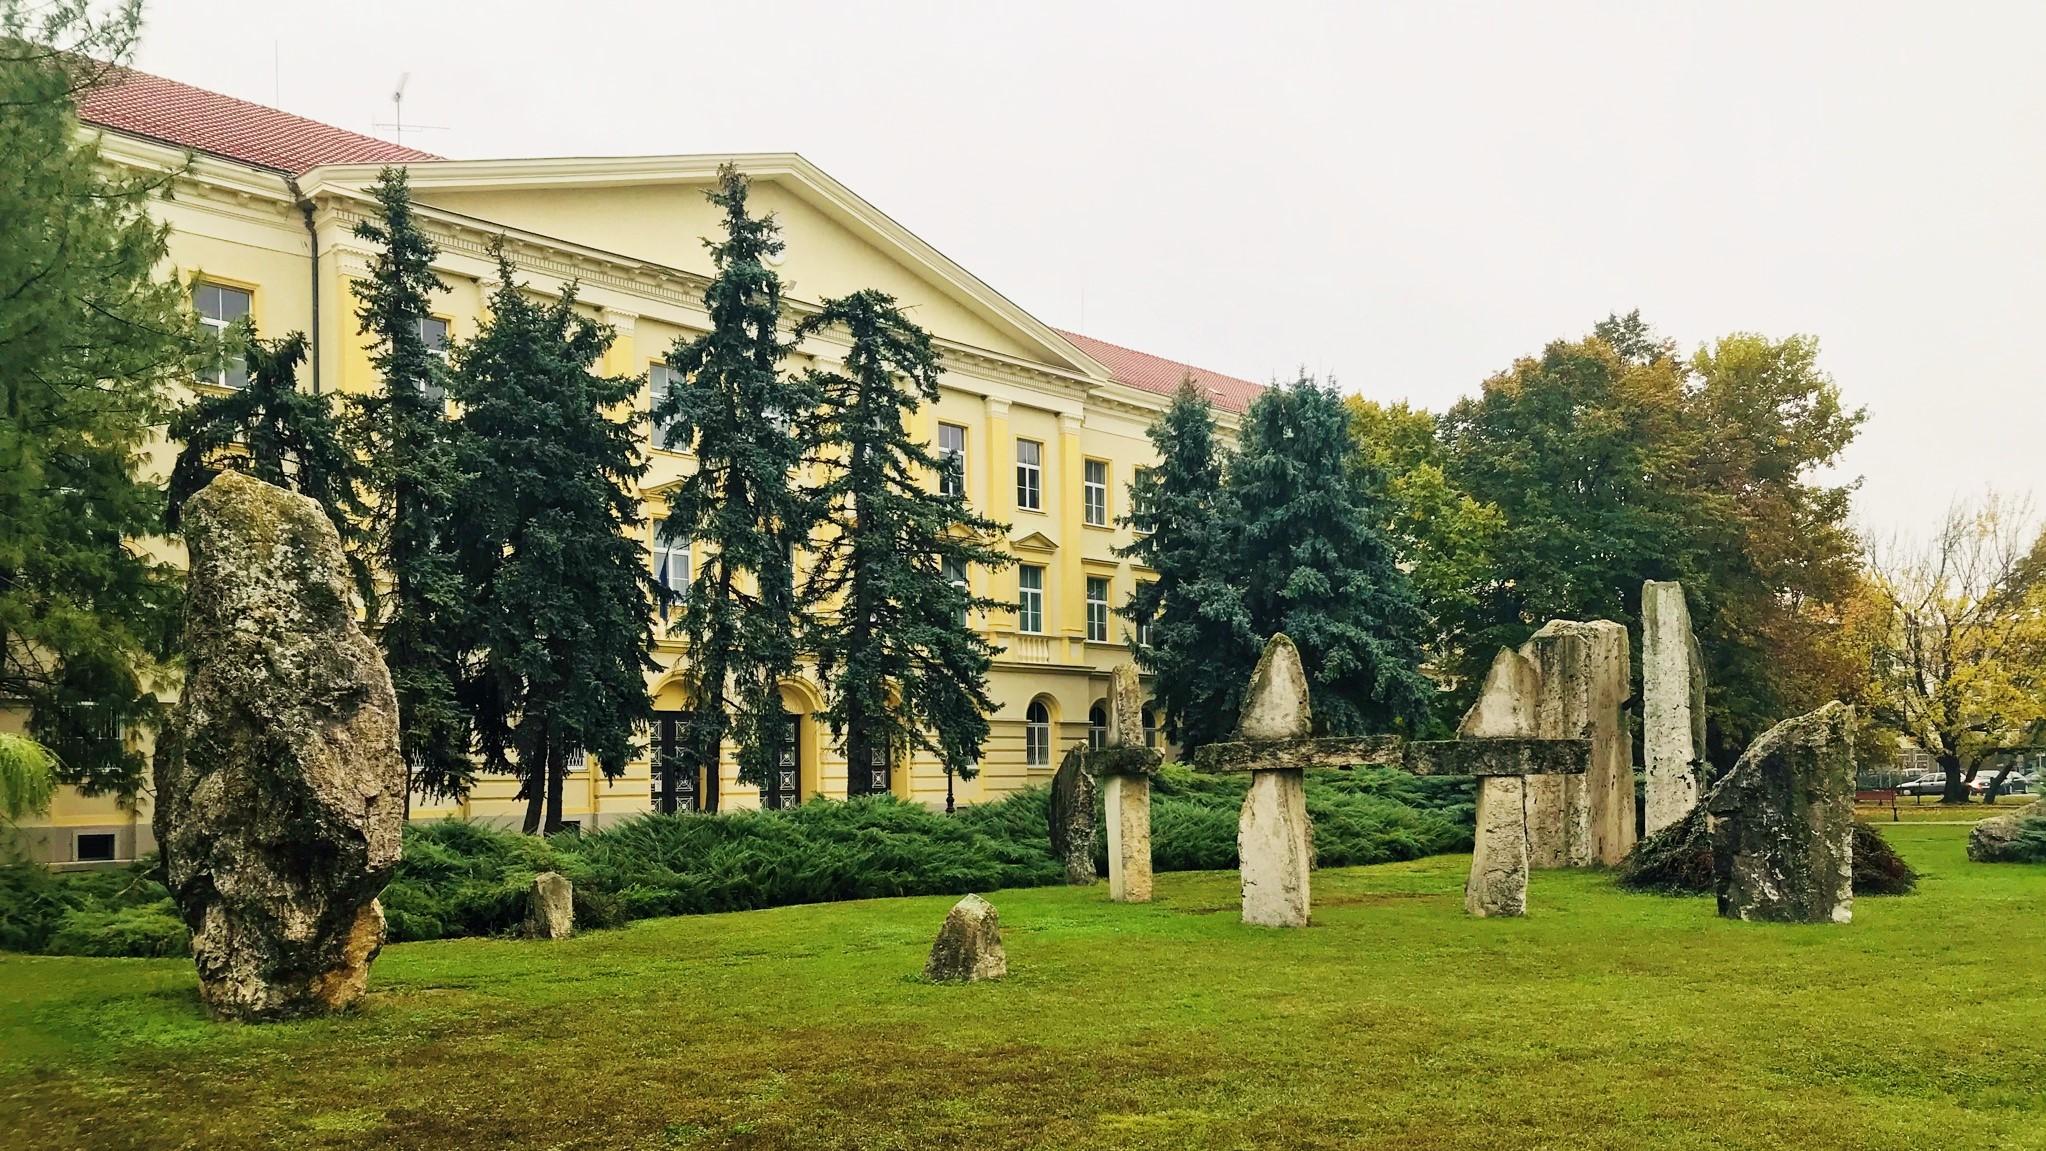 Oroshaza_Tortenelmi_Emlekpark_1.JPEG